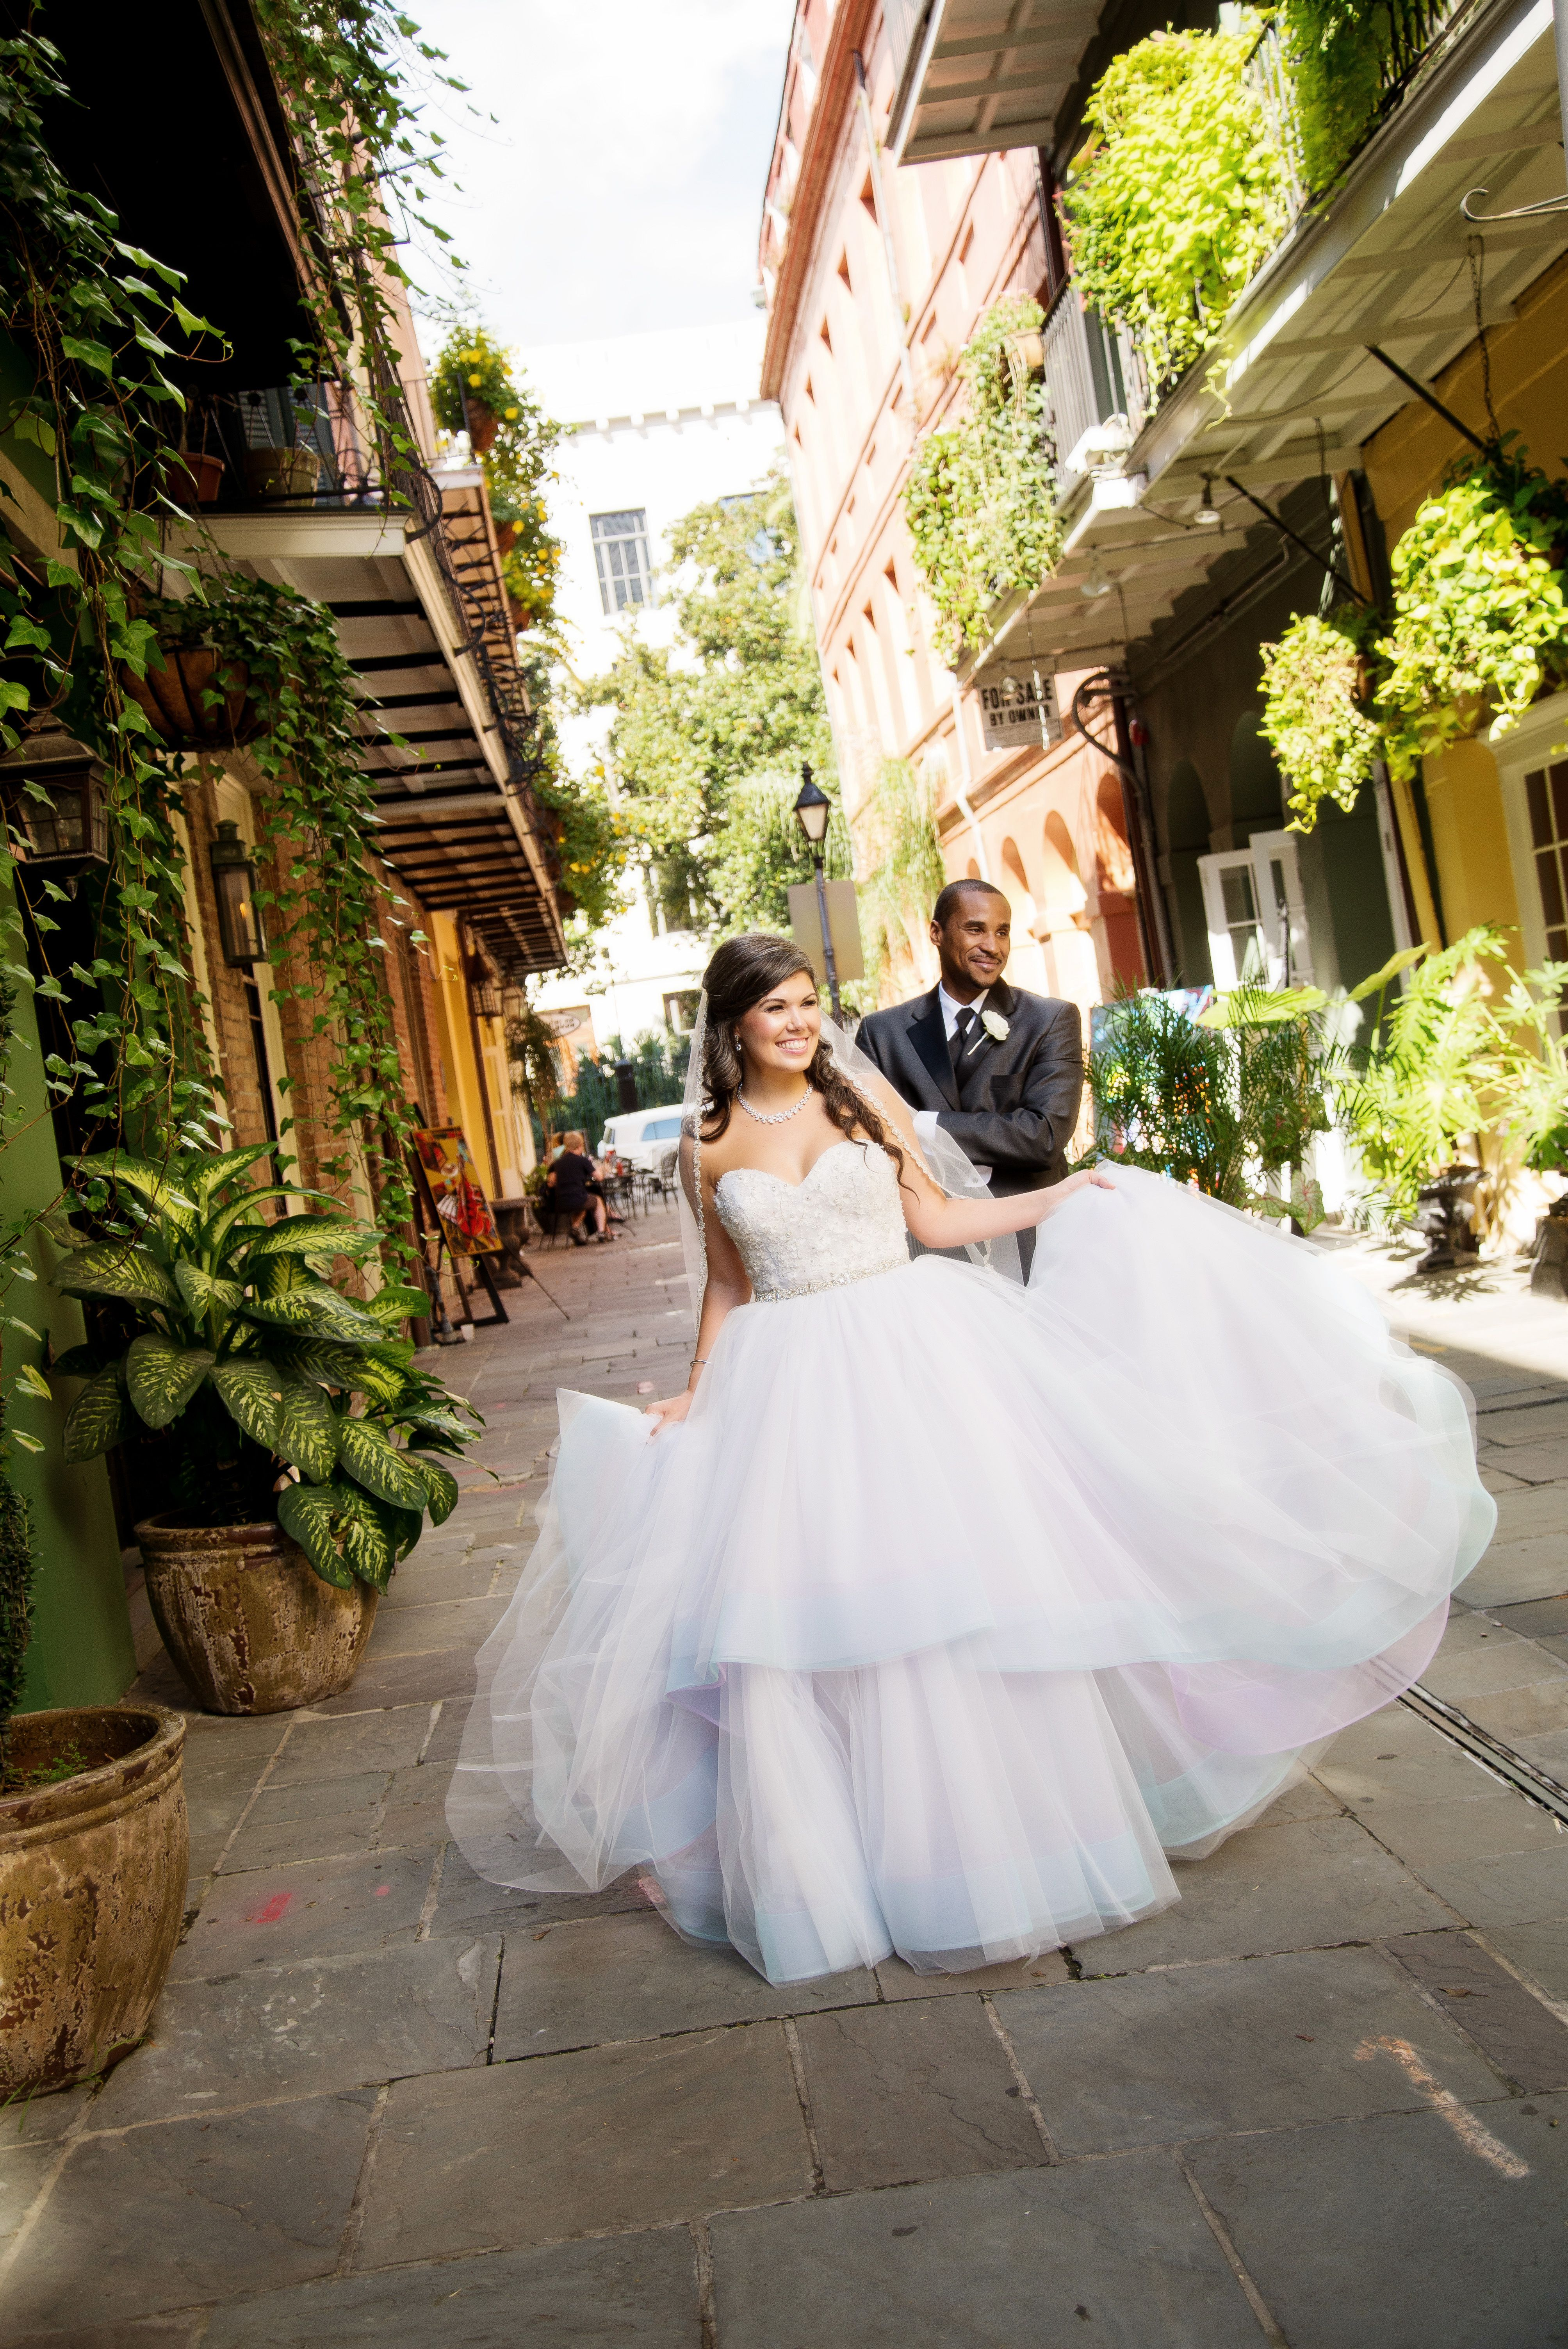 Dress lazaro fun couple on colorful new orleans street kleinfeld